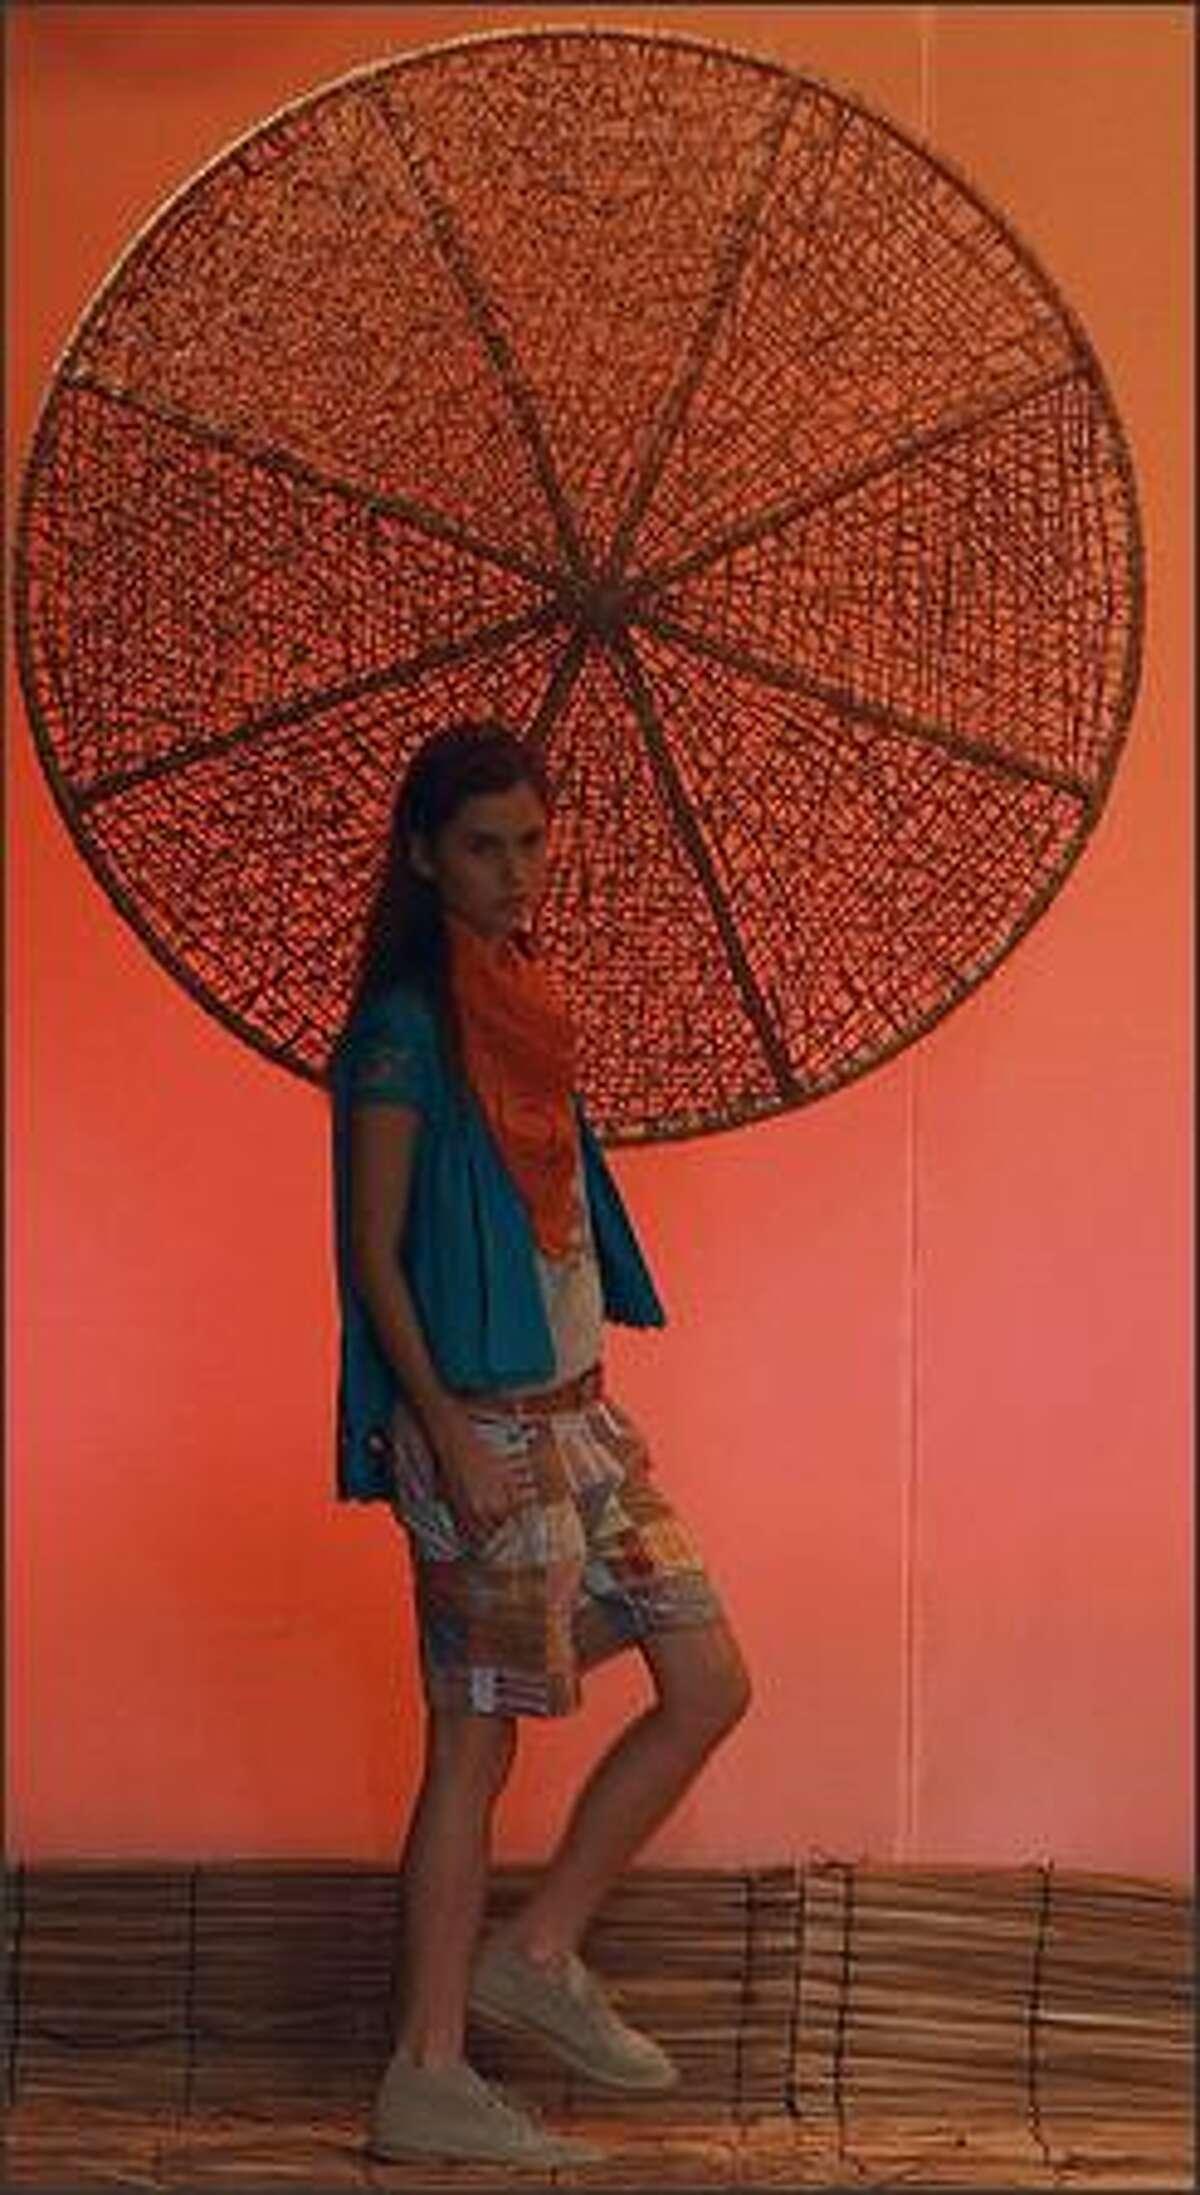 A model presents a creation by designer Teca during the Rio Fashion Week Spring-Summer 2008-09 collection, at the Marina da Gloria on Monday in Rio de Janeiro, Brazil.